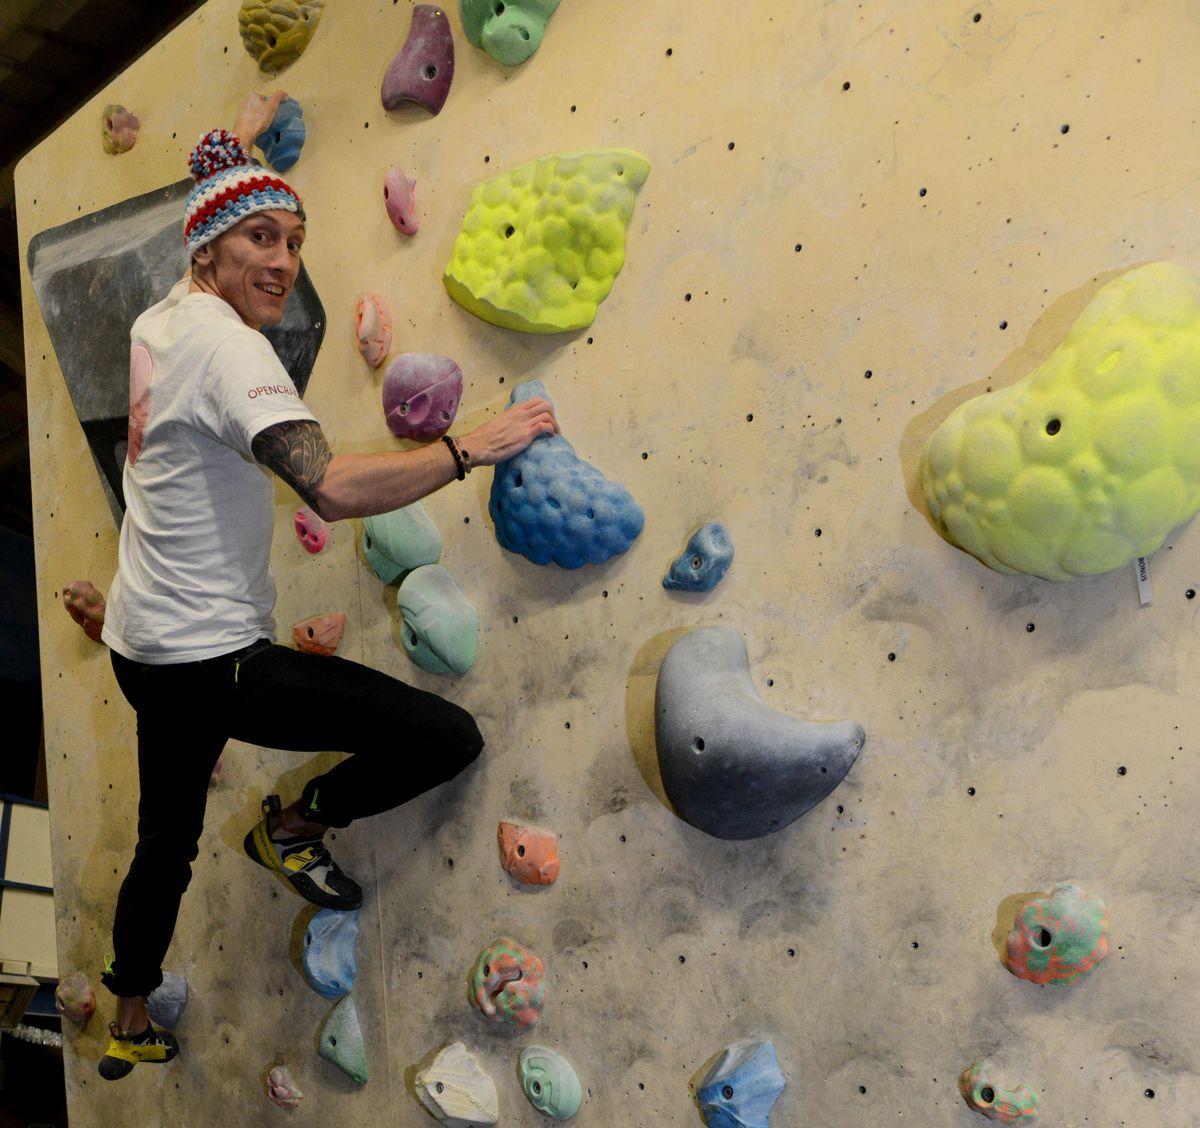 Luke at Shropshire Climbing Centre in Newport